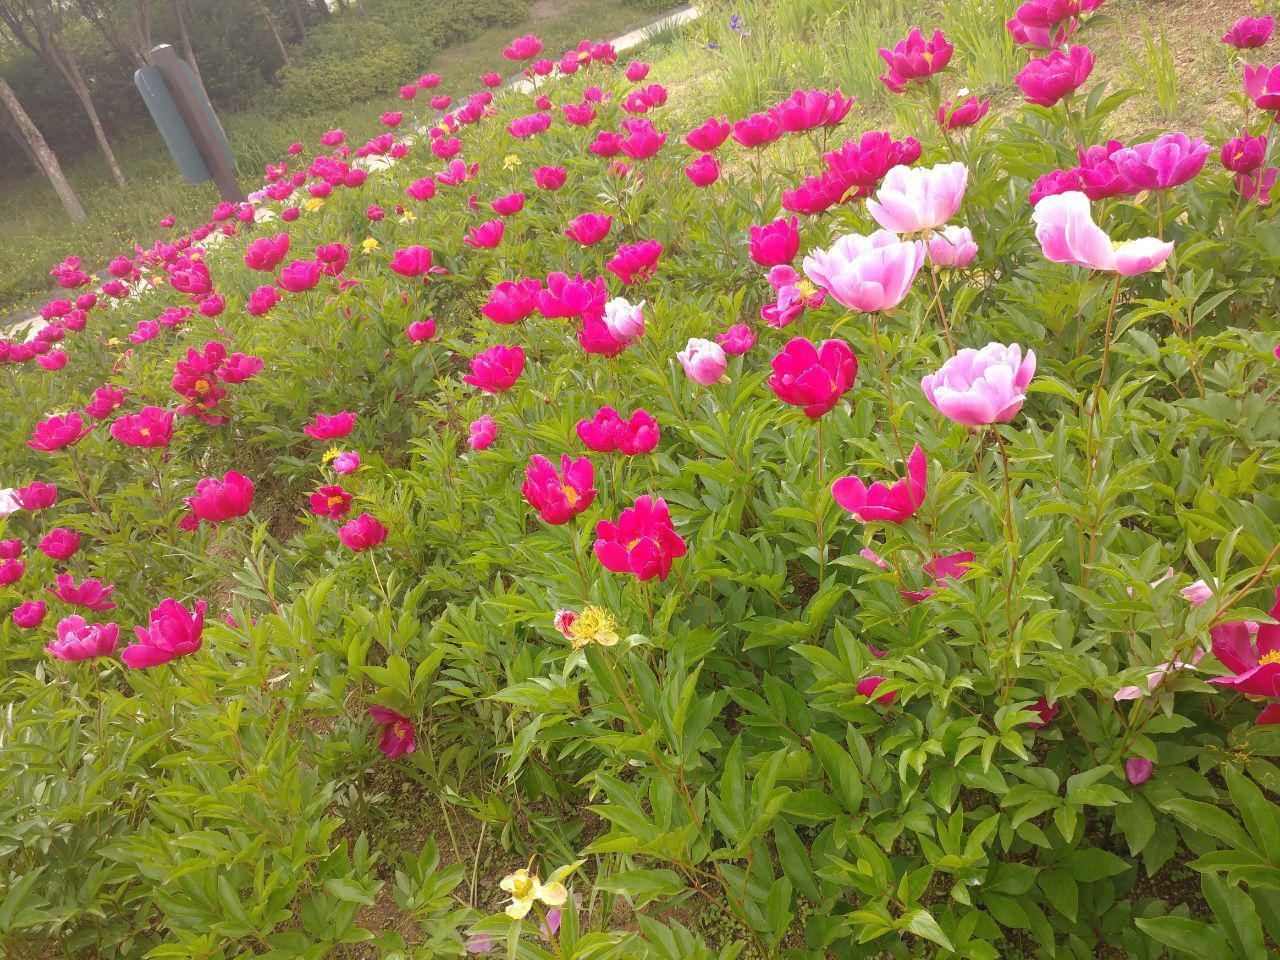 photo_2018-05-27_12-48-45.jpg